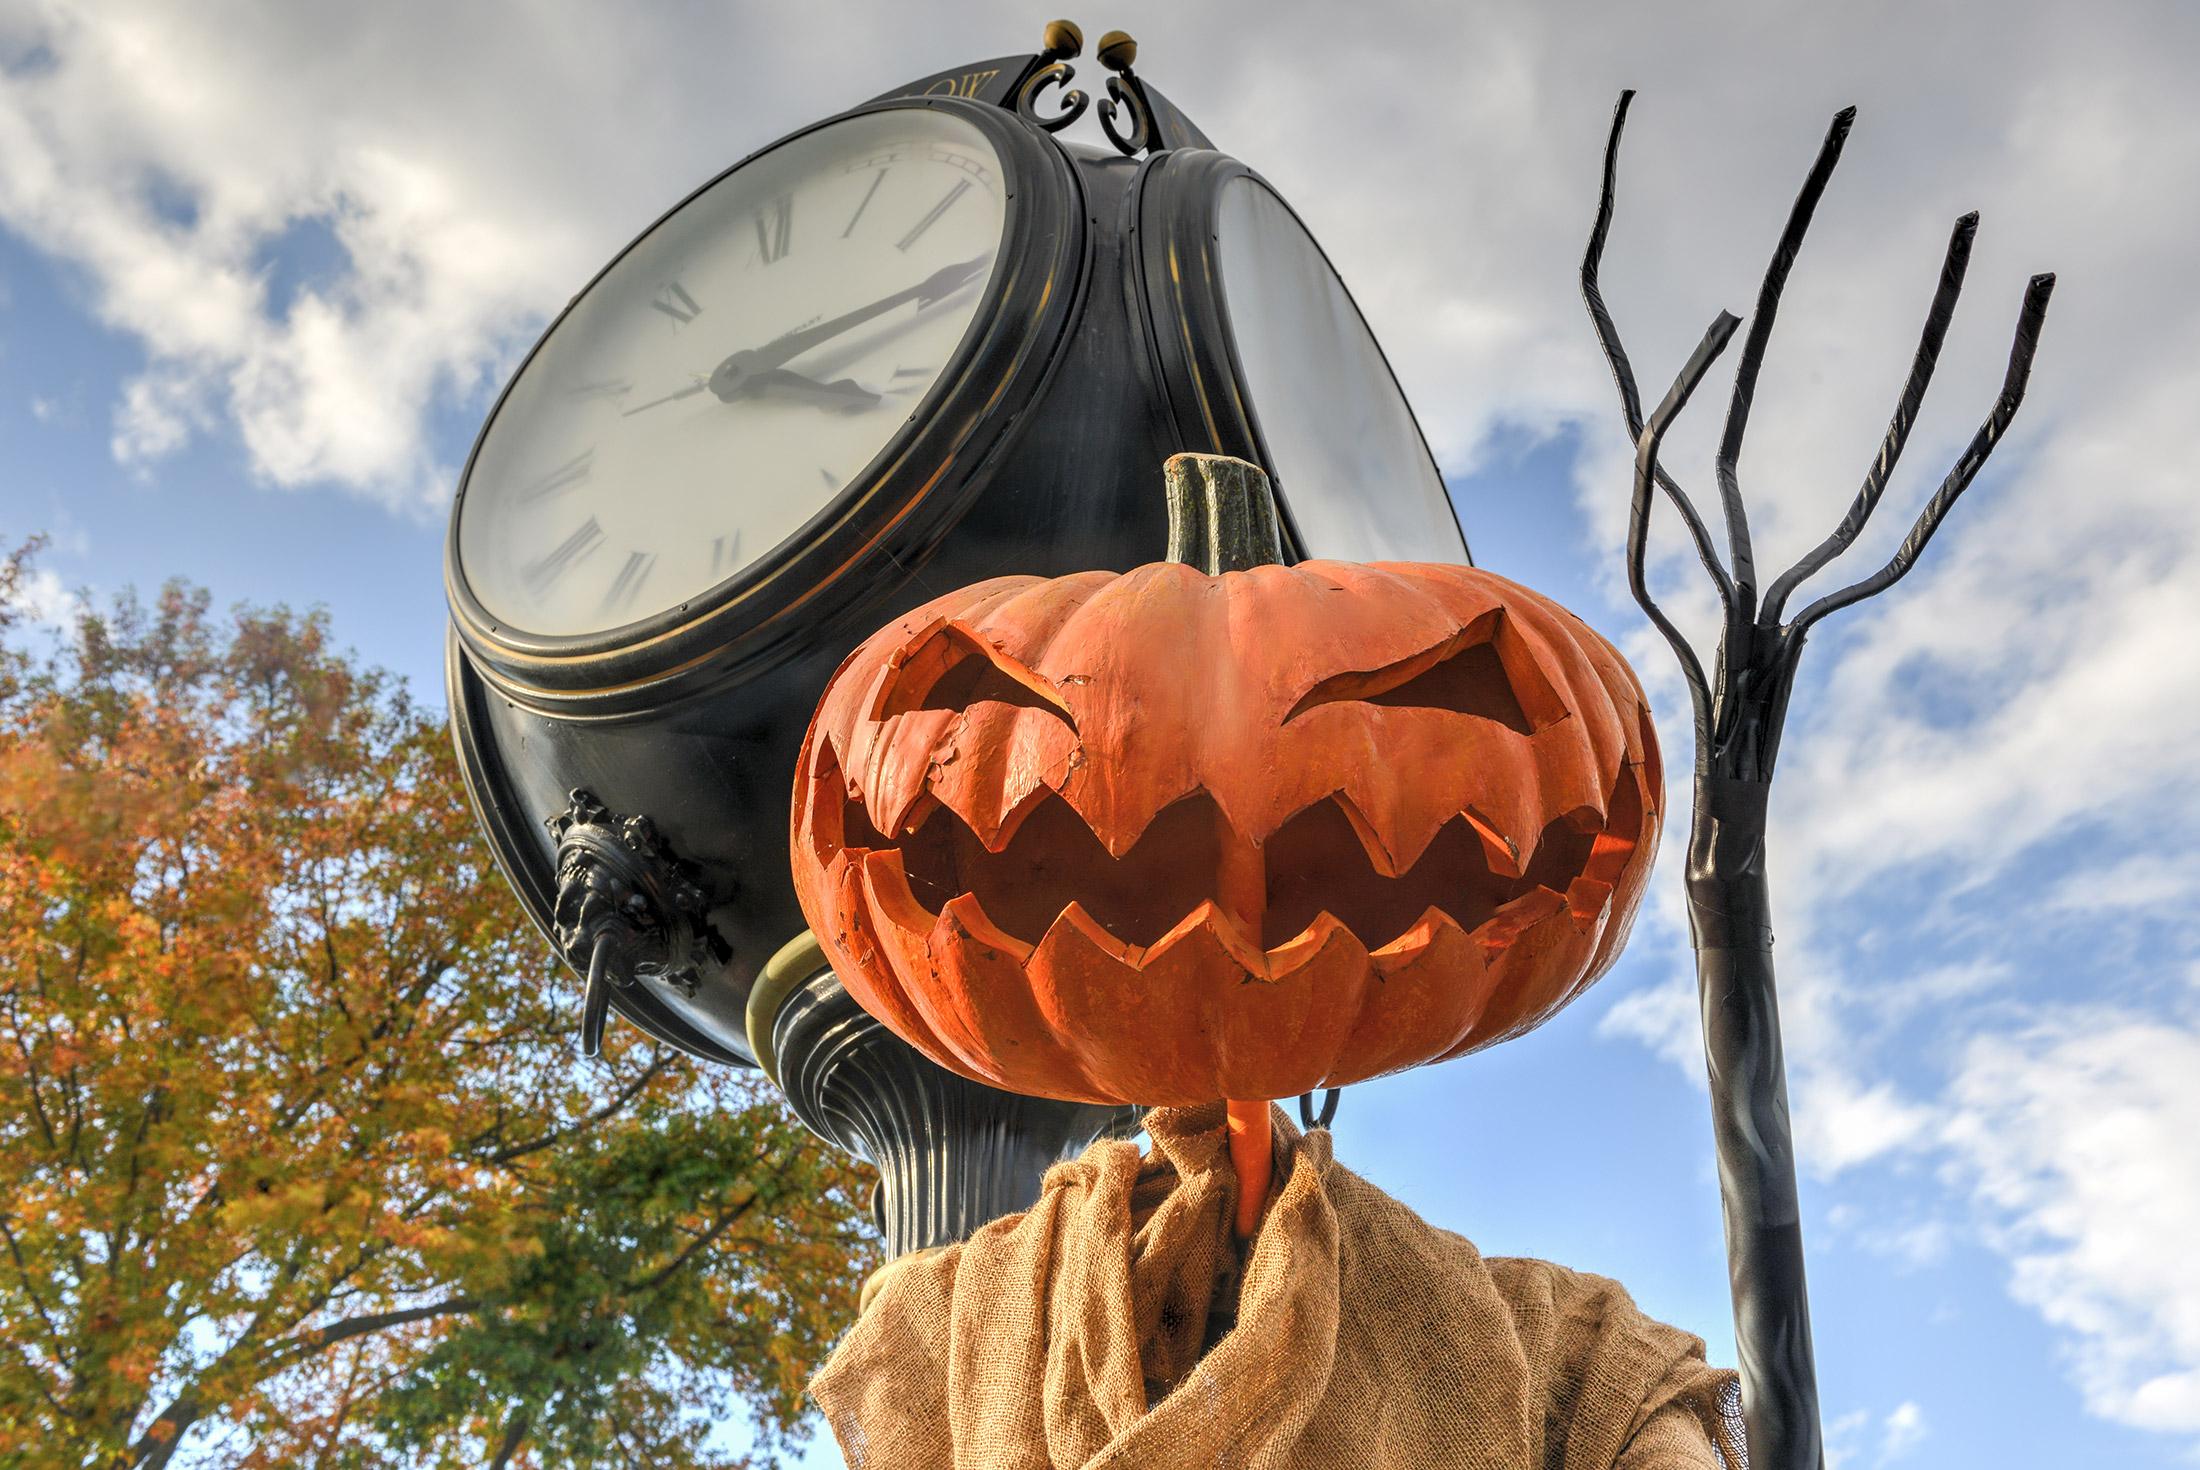 Halloween in America 2